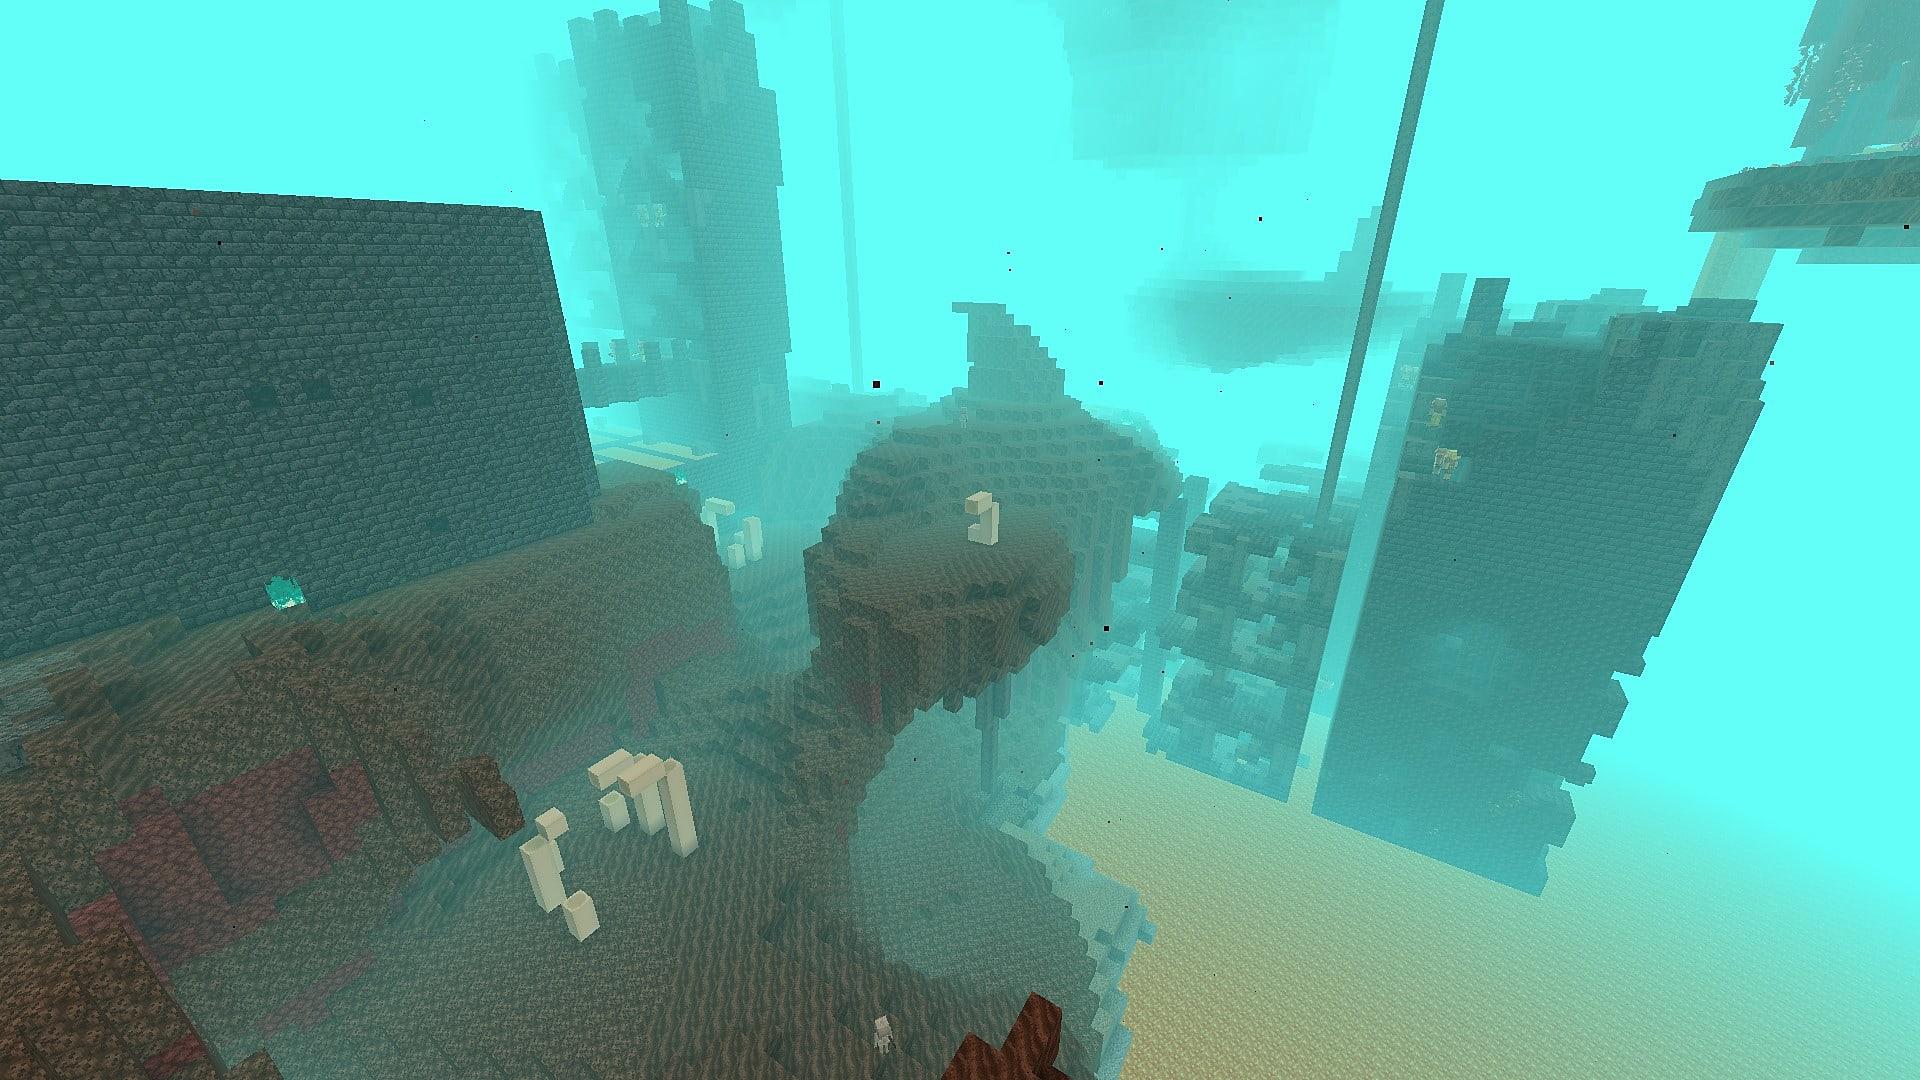 Top 1111 Minecraft 11.111.11 Seeds for October 11111111  Slide 1111  Minecraft